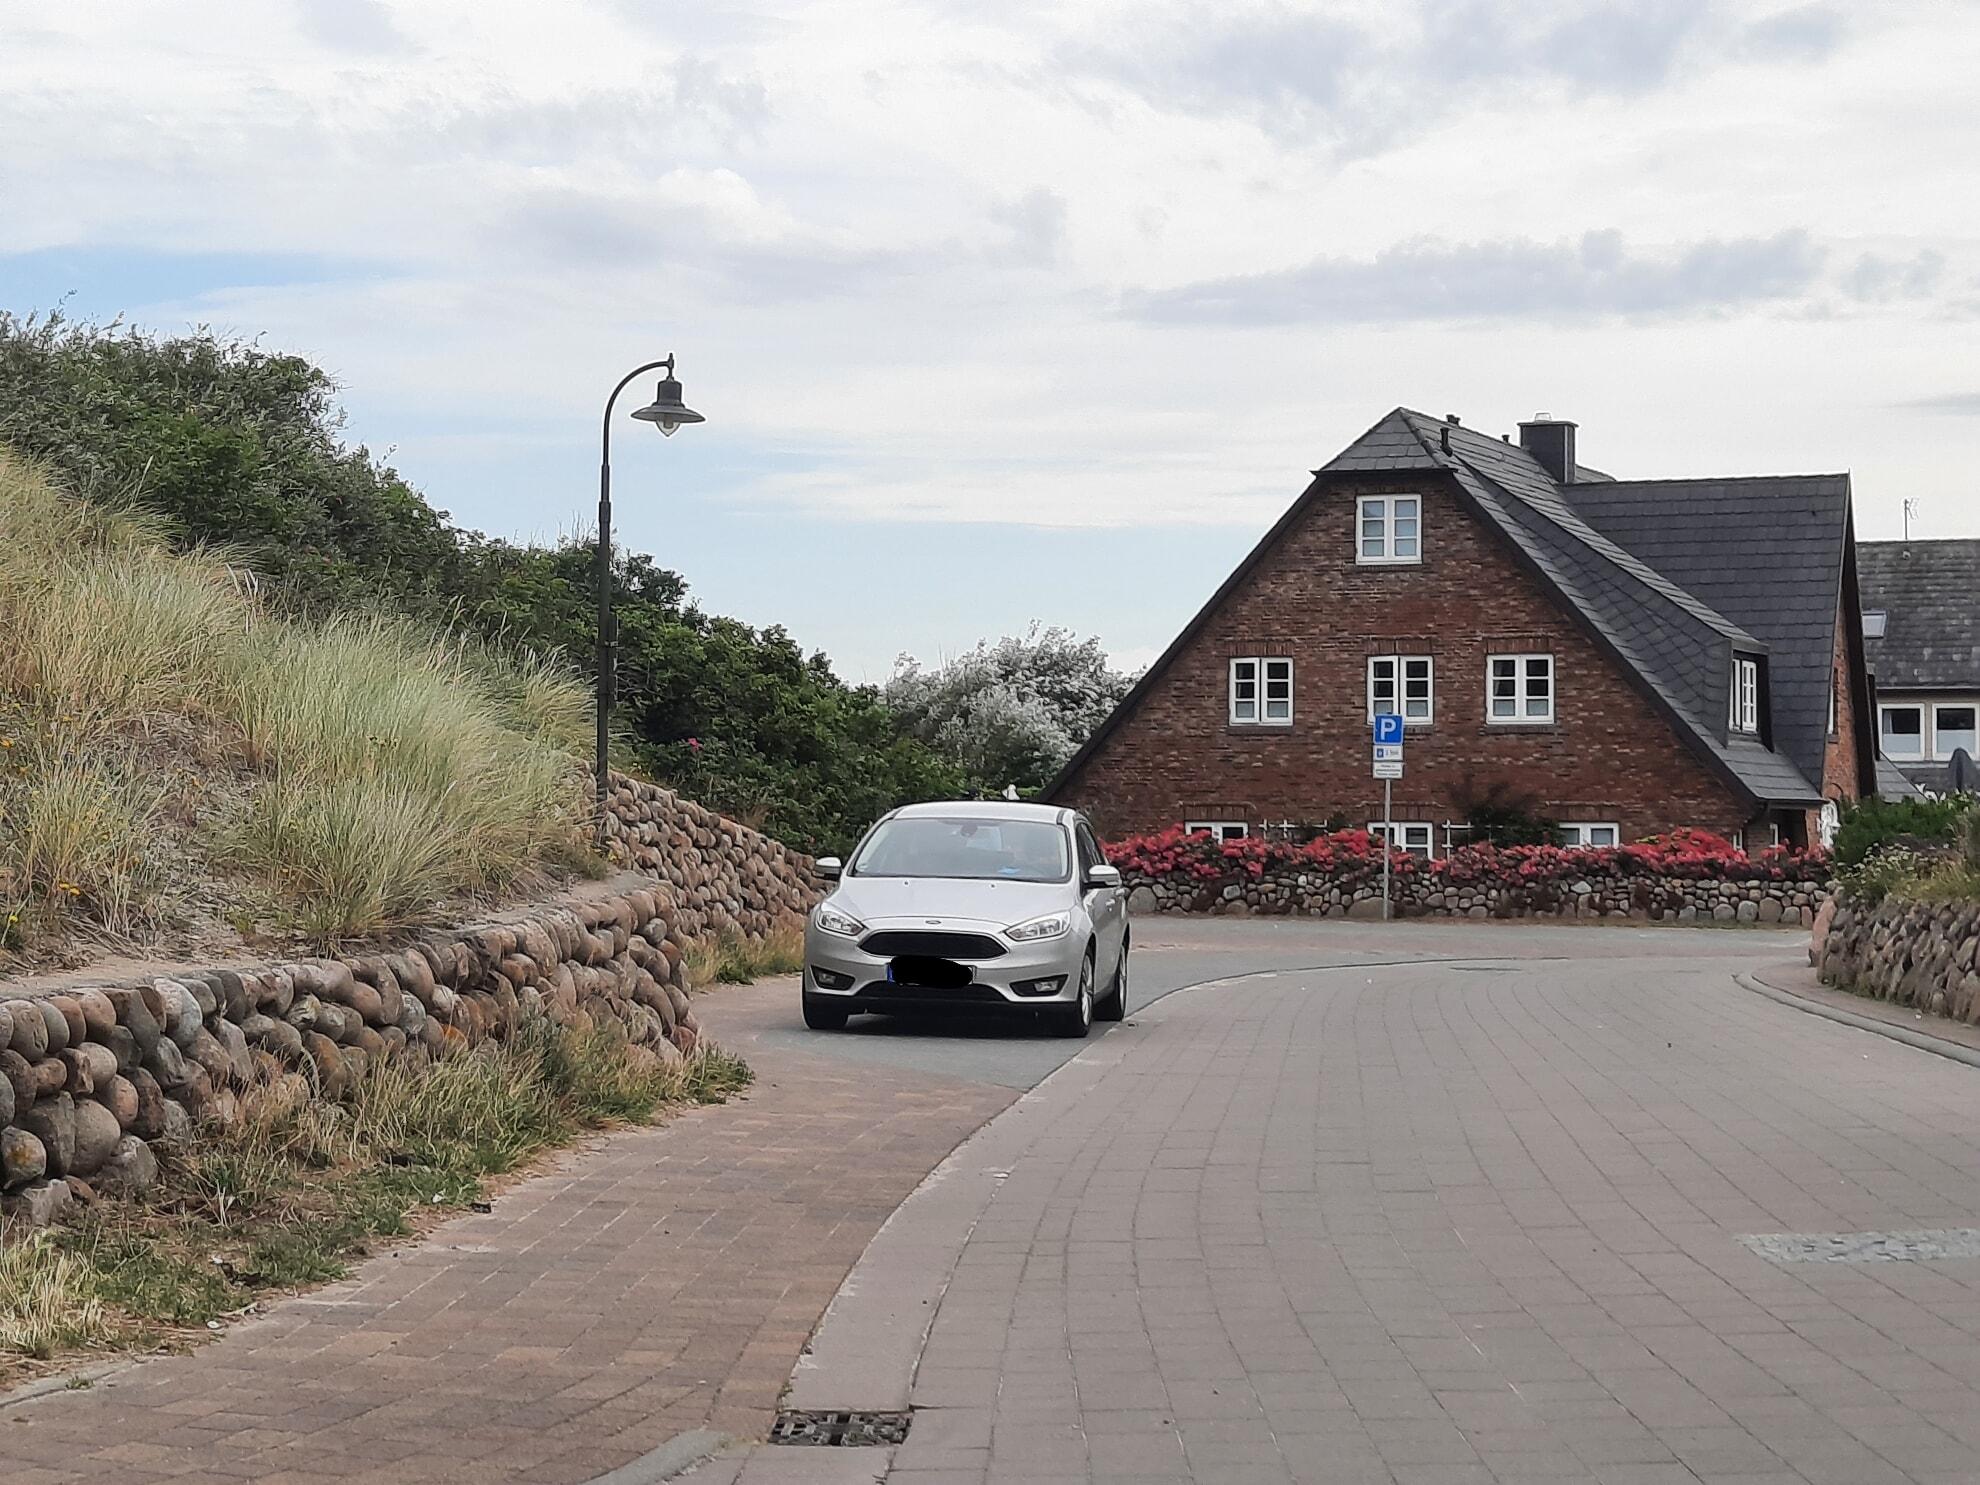 parkplatz-odde-wai